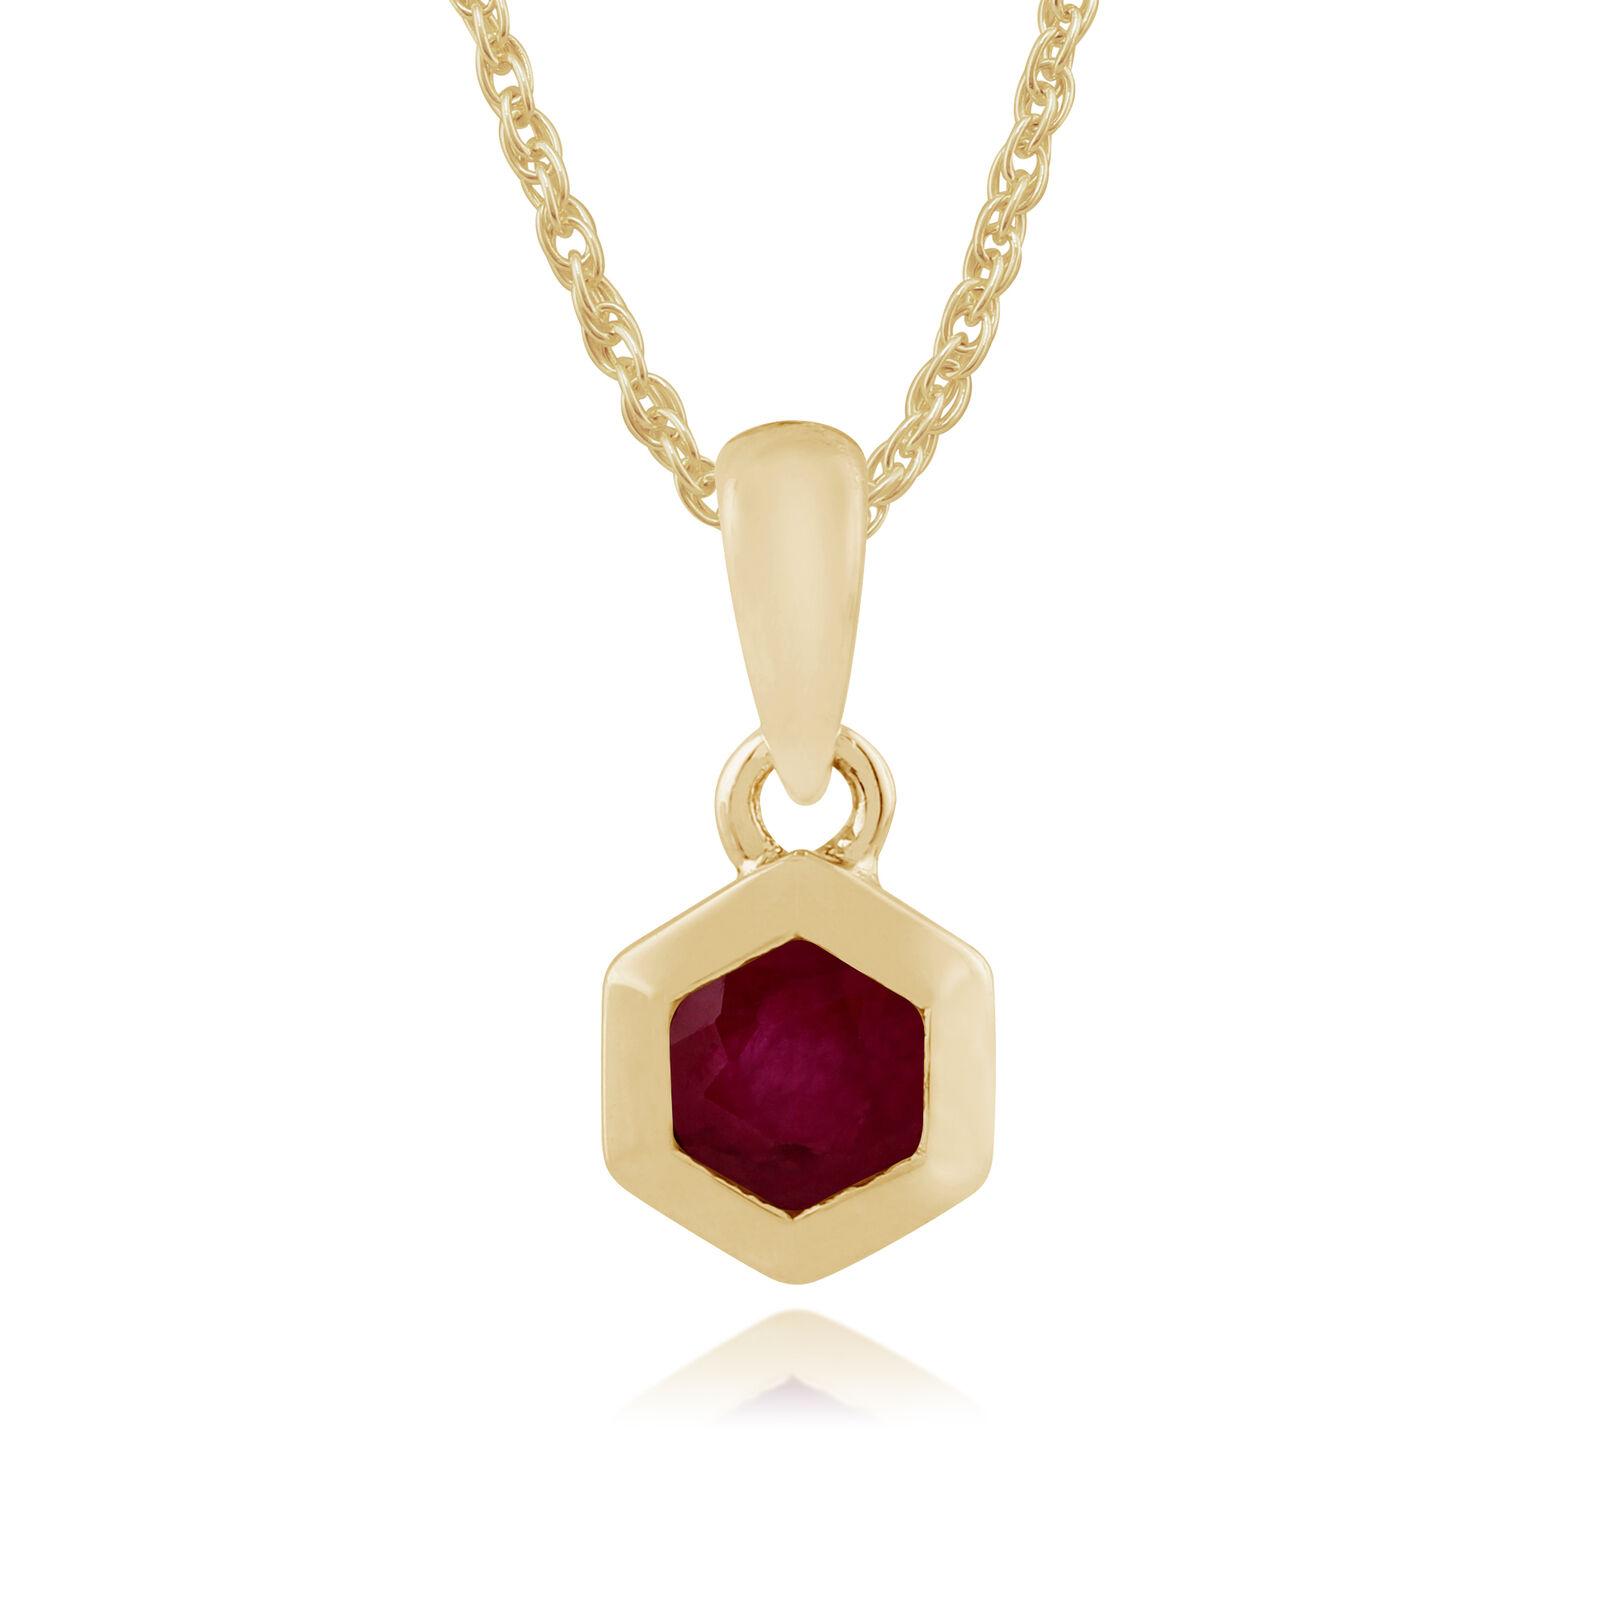 Gemondo 9ct Yellow gold 0.27ct Ruby Hexagon Pendant on Chain